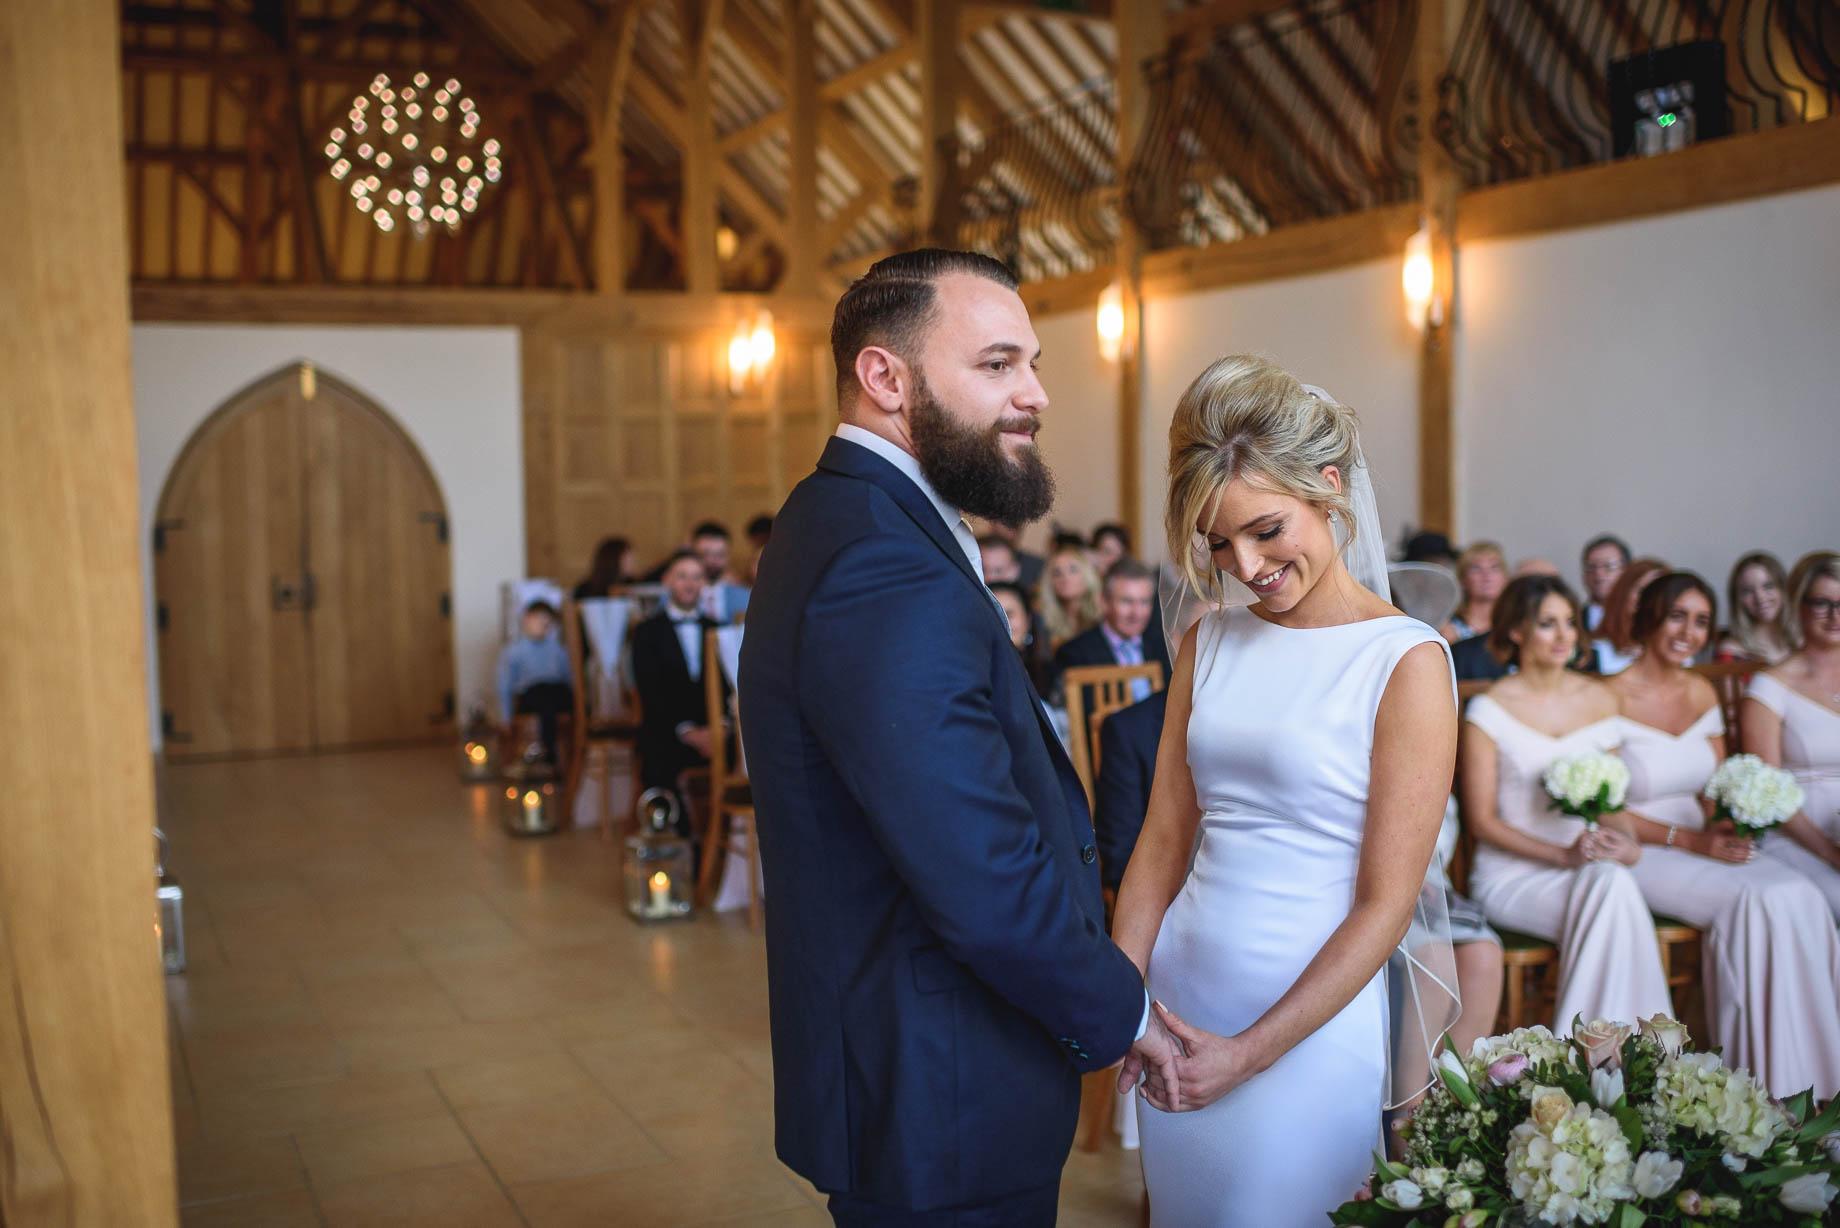 Rivervale Barn wedding photography - Becki + Thom